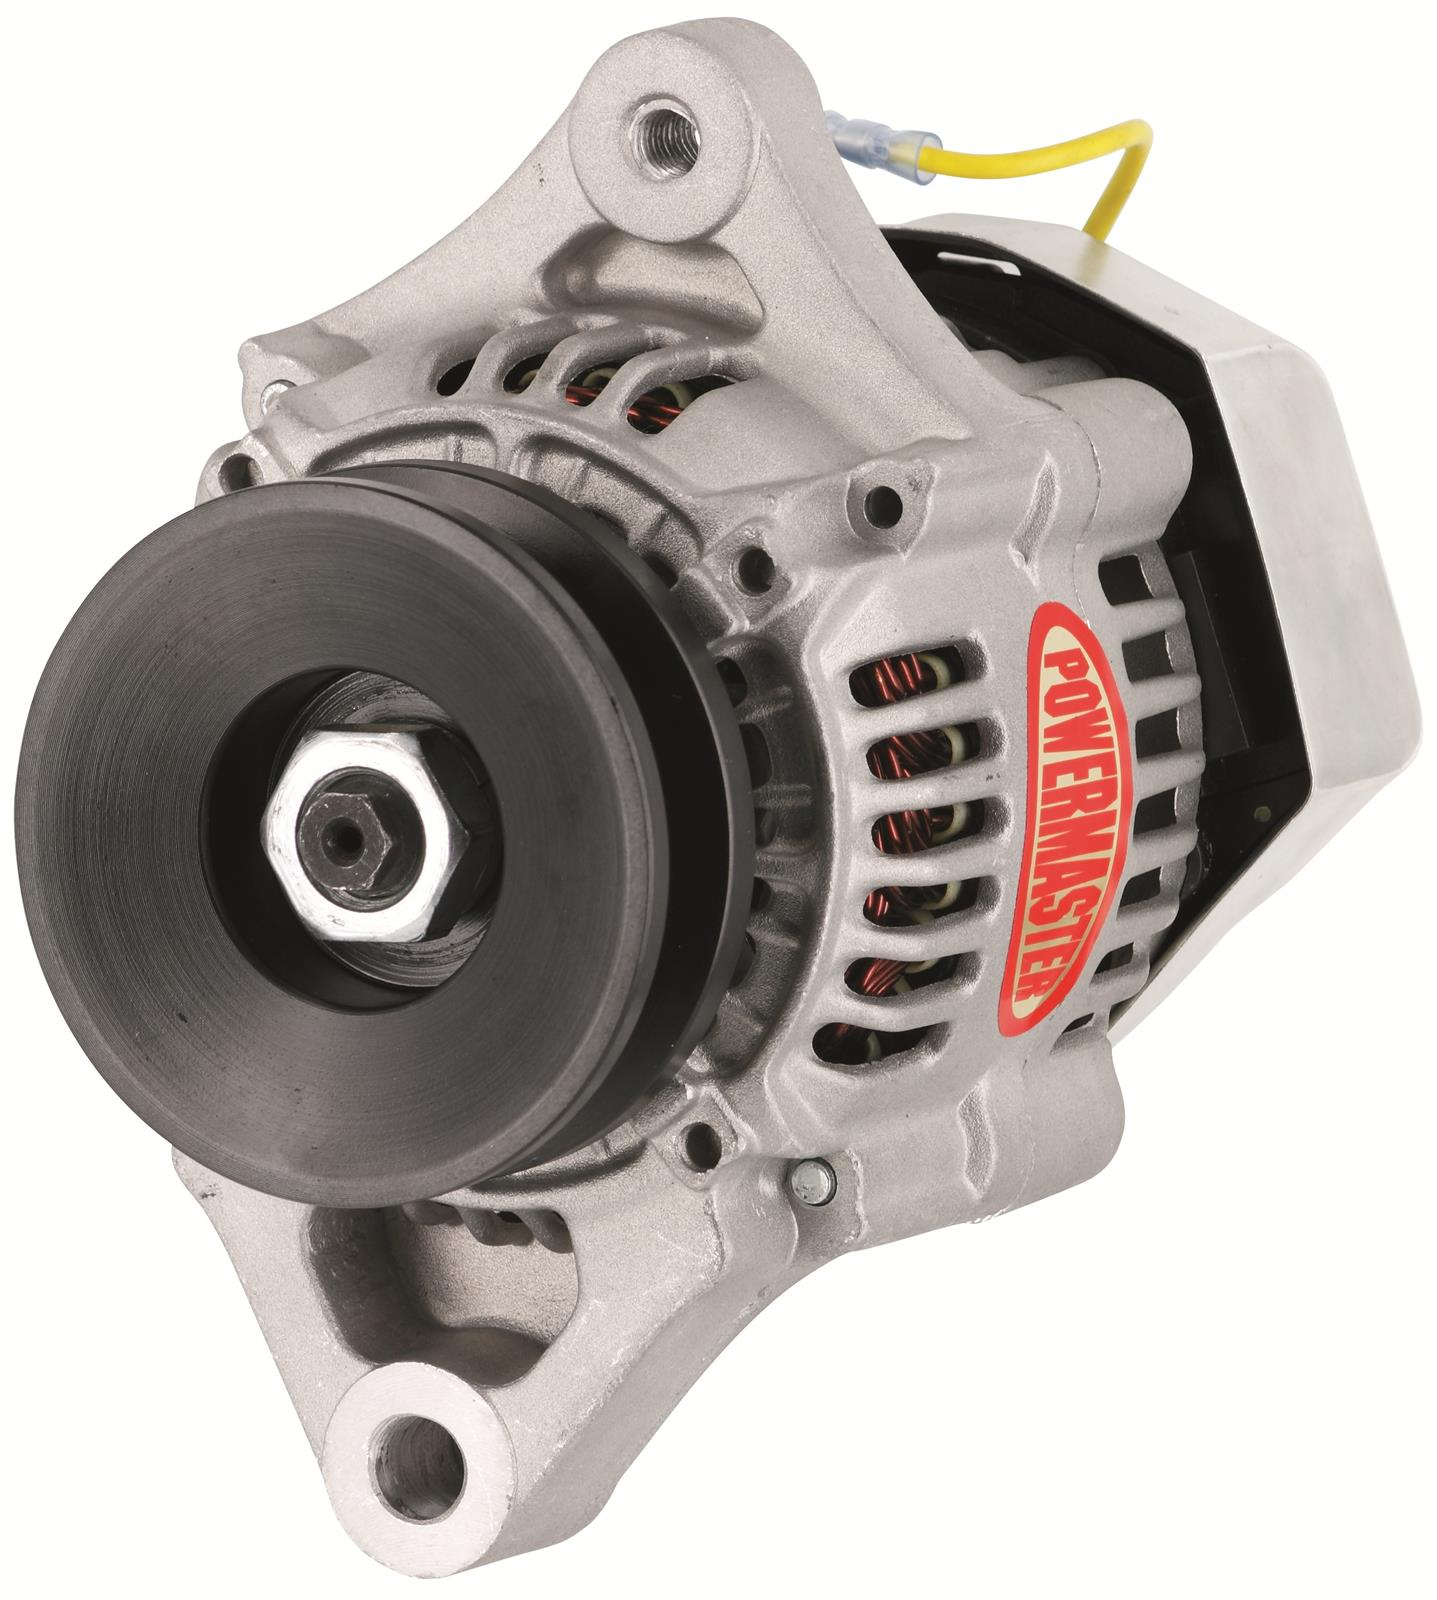 Find Powermaster Race Alternator 50 Amps 12v Nippondenso Case 8172 Alternators Chrysler Internal Regulator Amp Natural Each